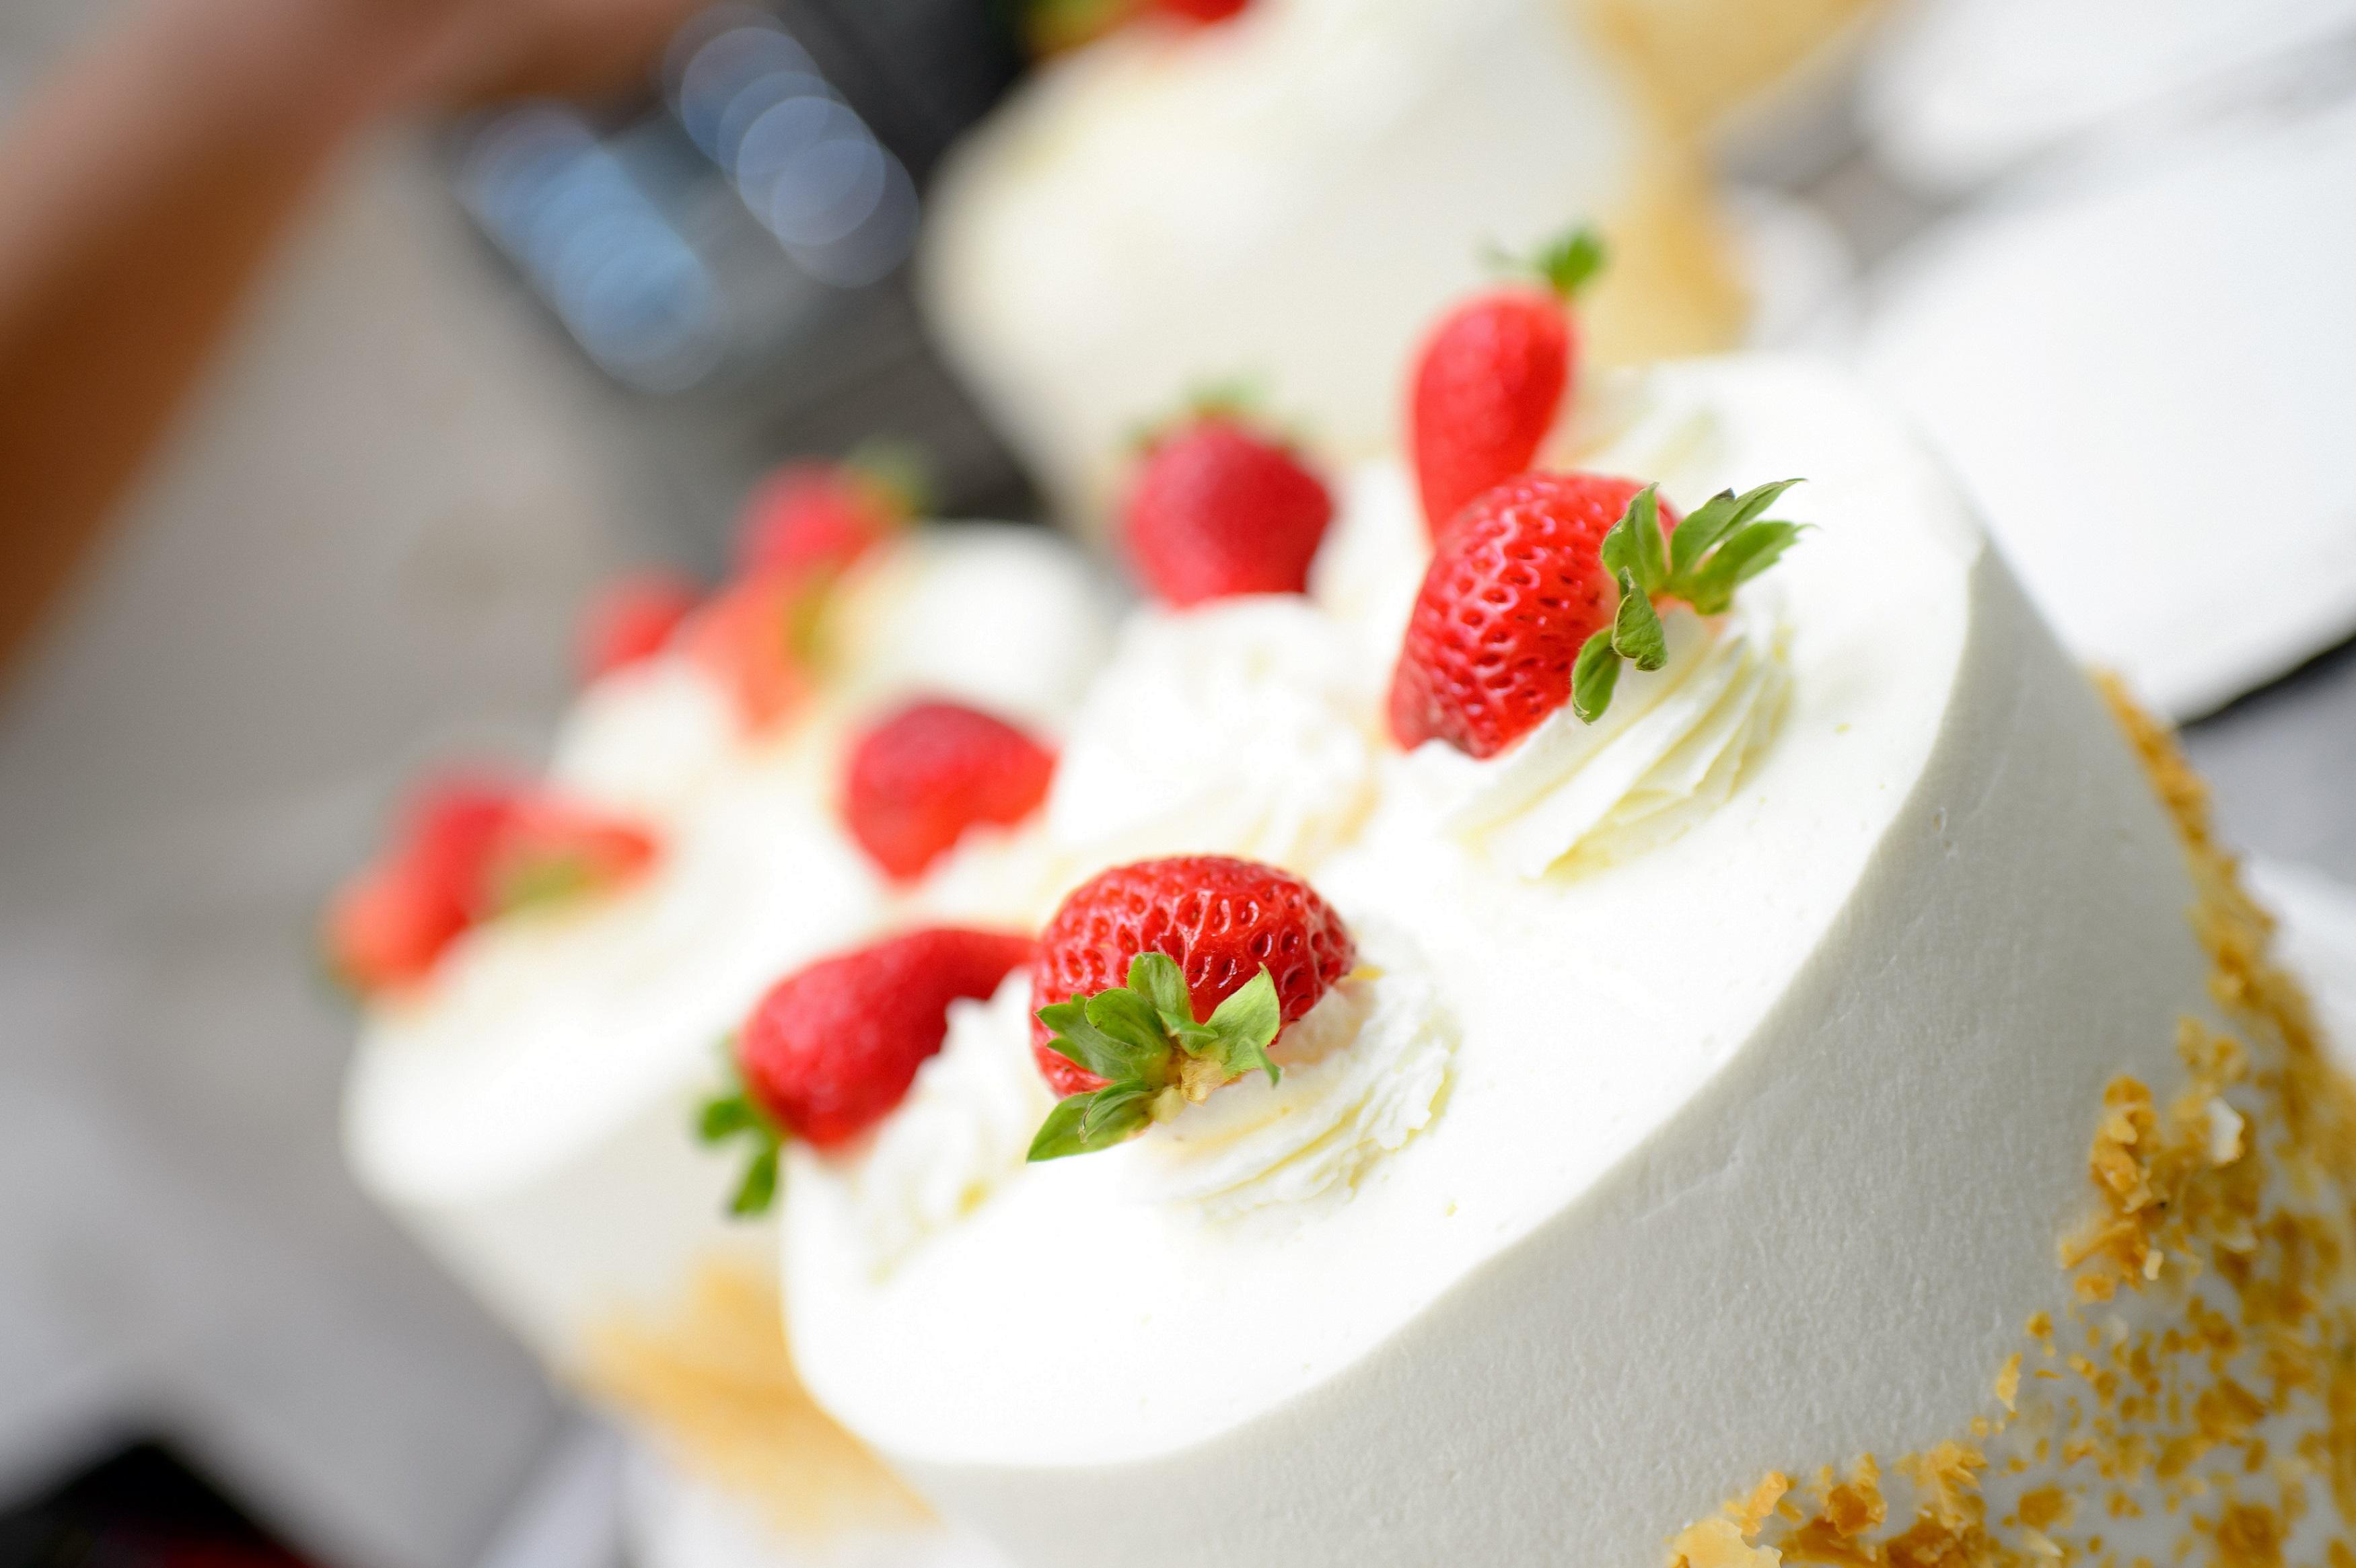 Strawberry shortcake at Freed's Dessert